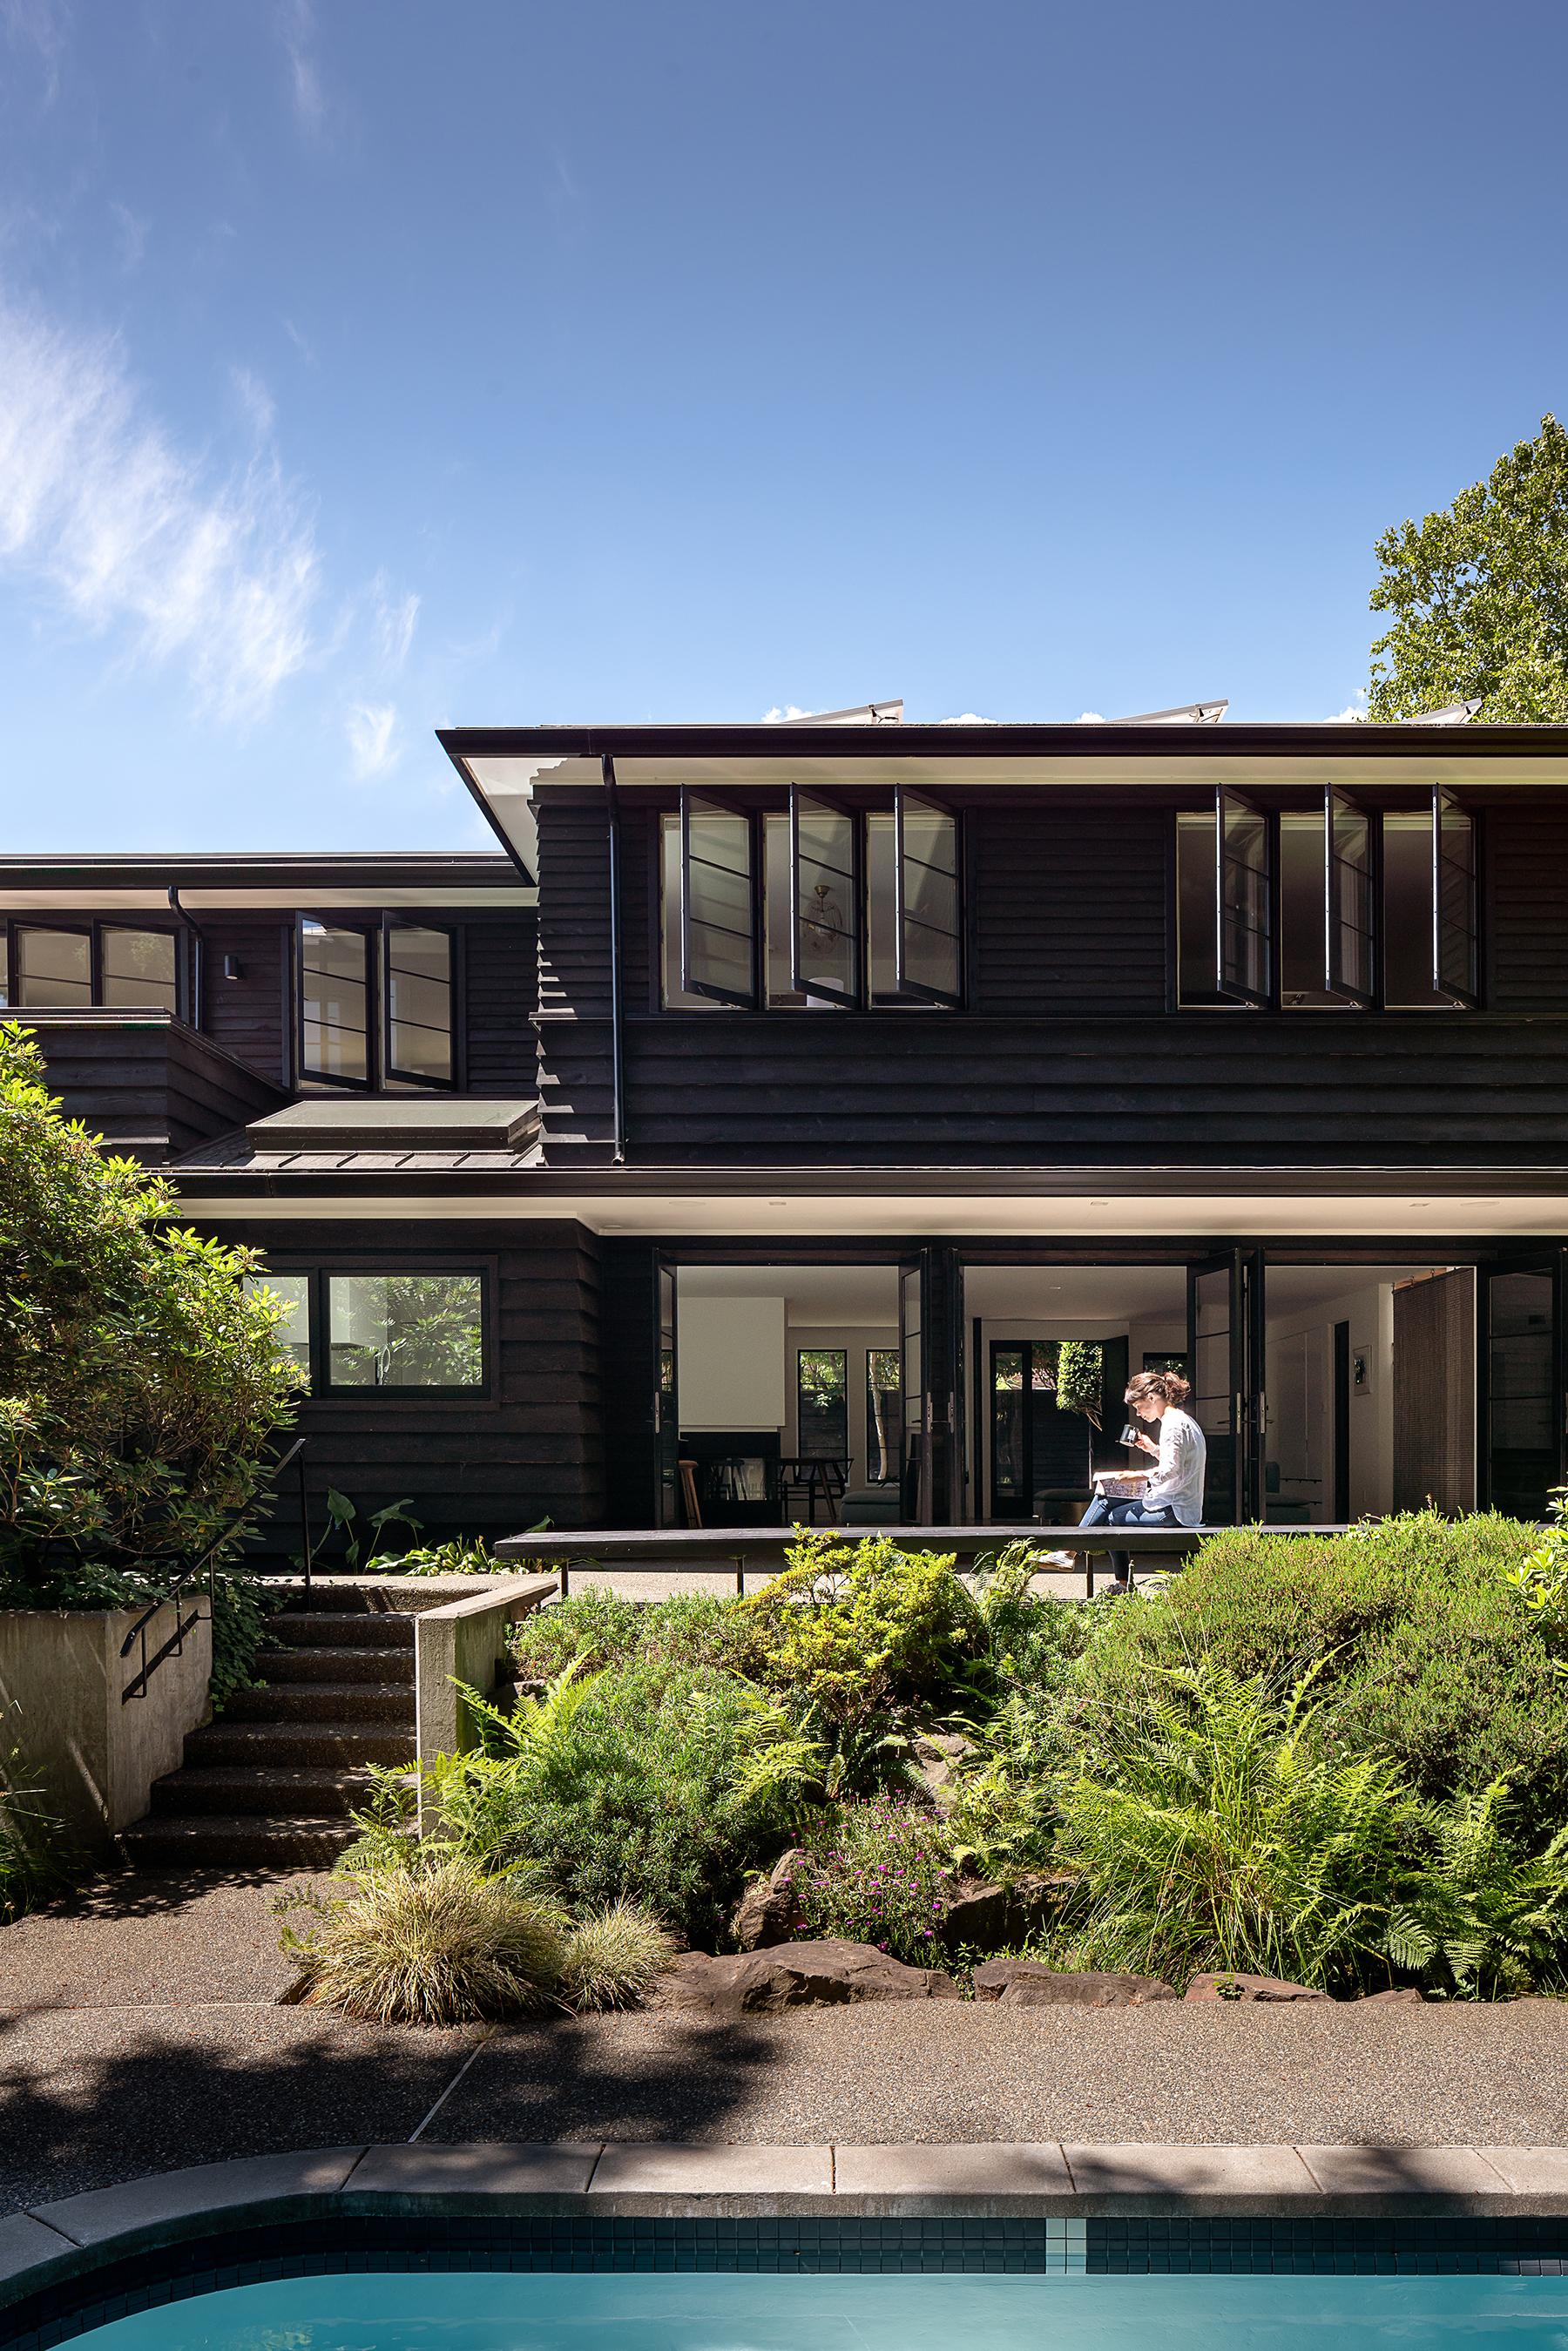 DuHamelArchitecture_HorizontalHouse_Garden.jpg